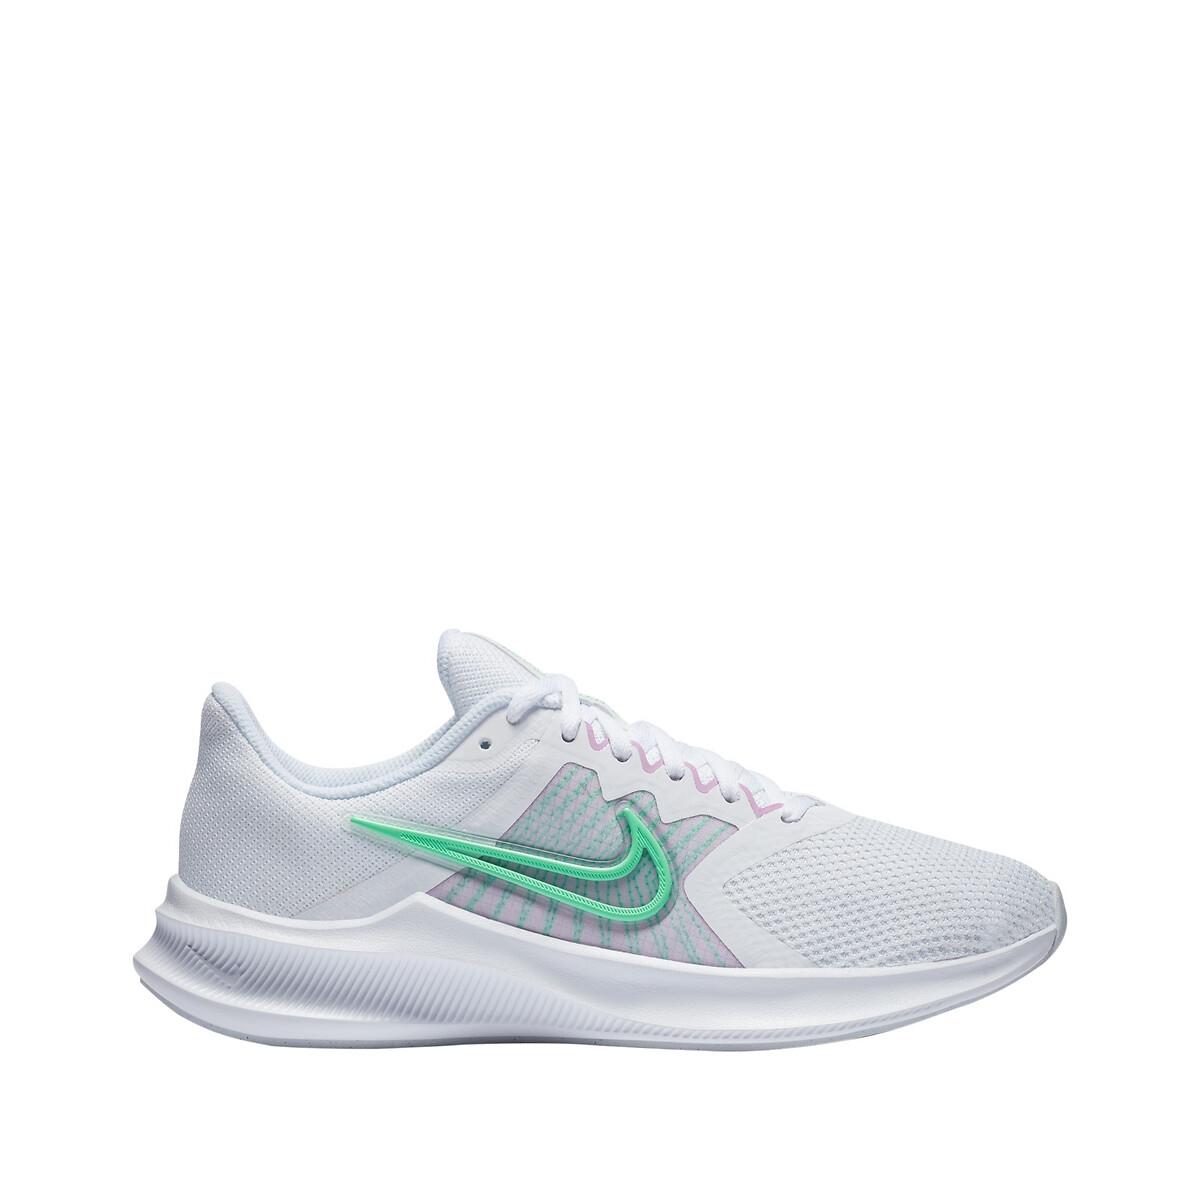 Nike Downshifter 11 Dames White/Infinite Lilac/Violet Shock/Green Glow Dames online kopen